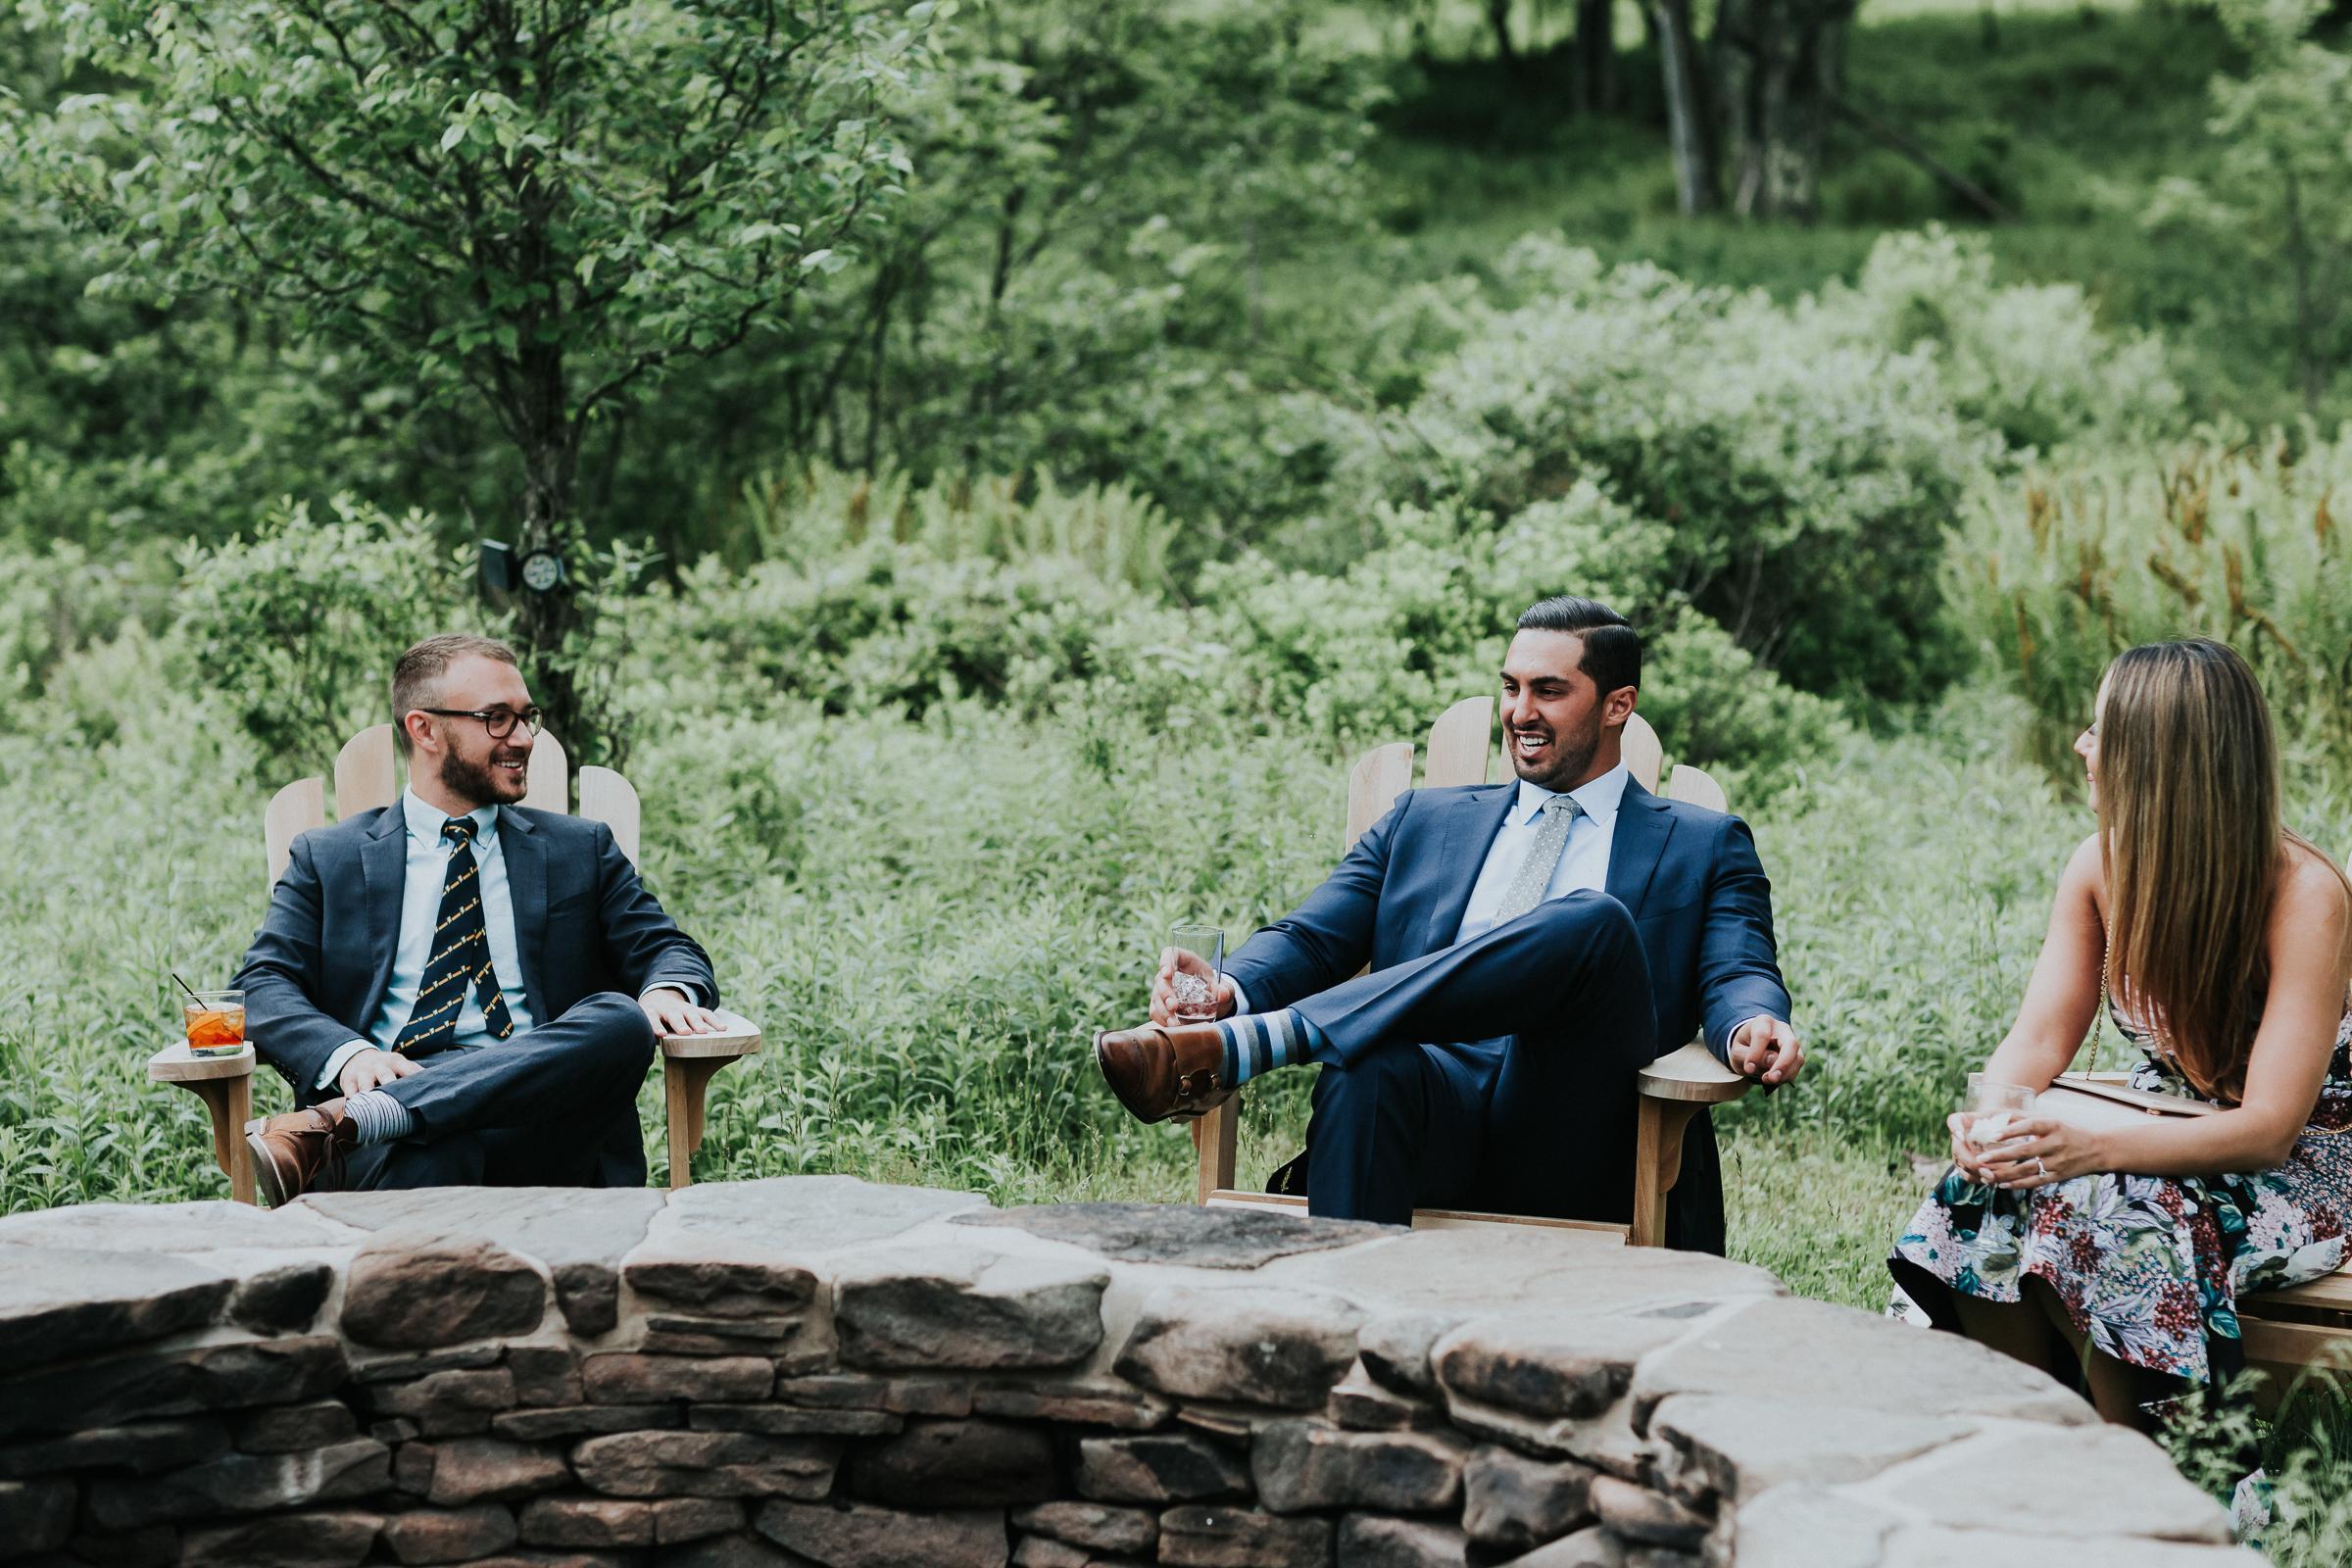 Handsome-Hollow-Long-Eddy-Catskills-New-York-Fine-Art-Documentary-Wedding-Photographer-81.jpg